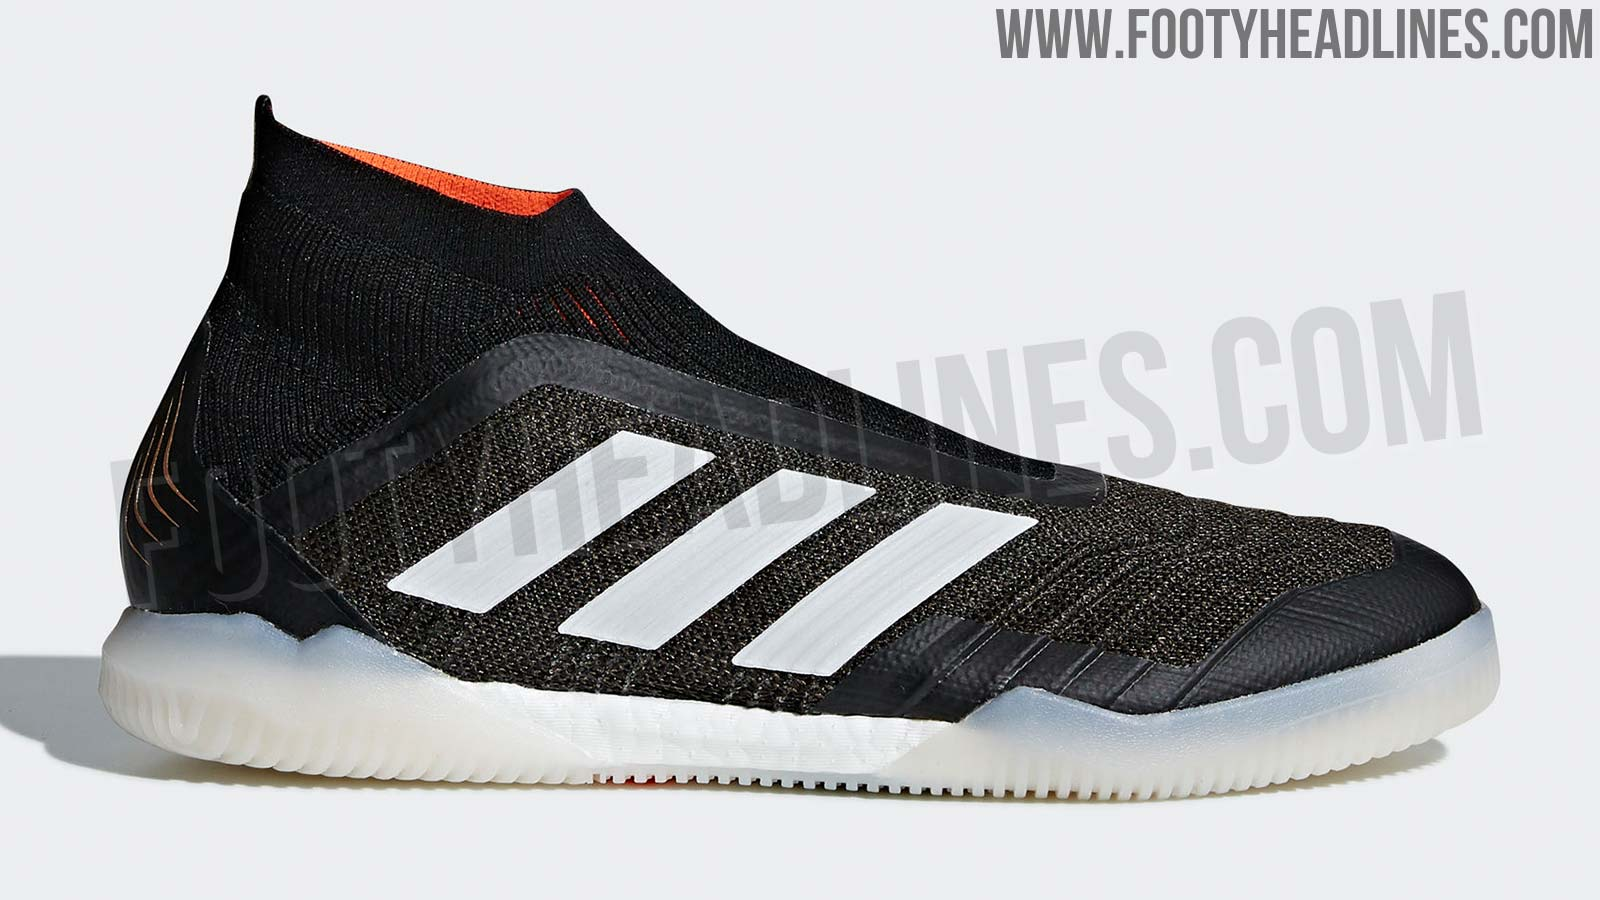 Adidas Indoor Outdoor Soccer Shoes